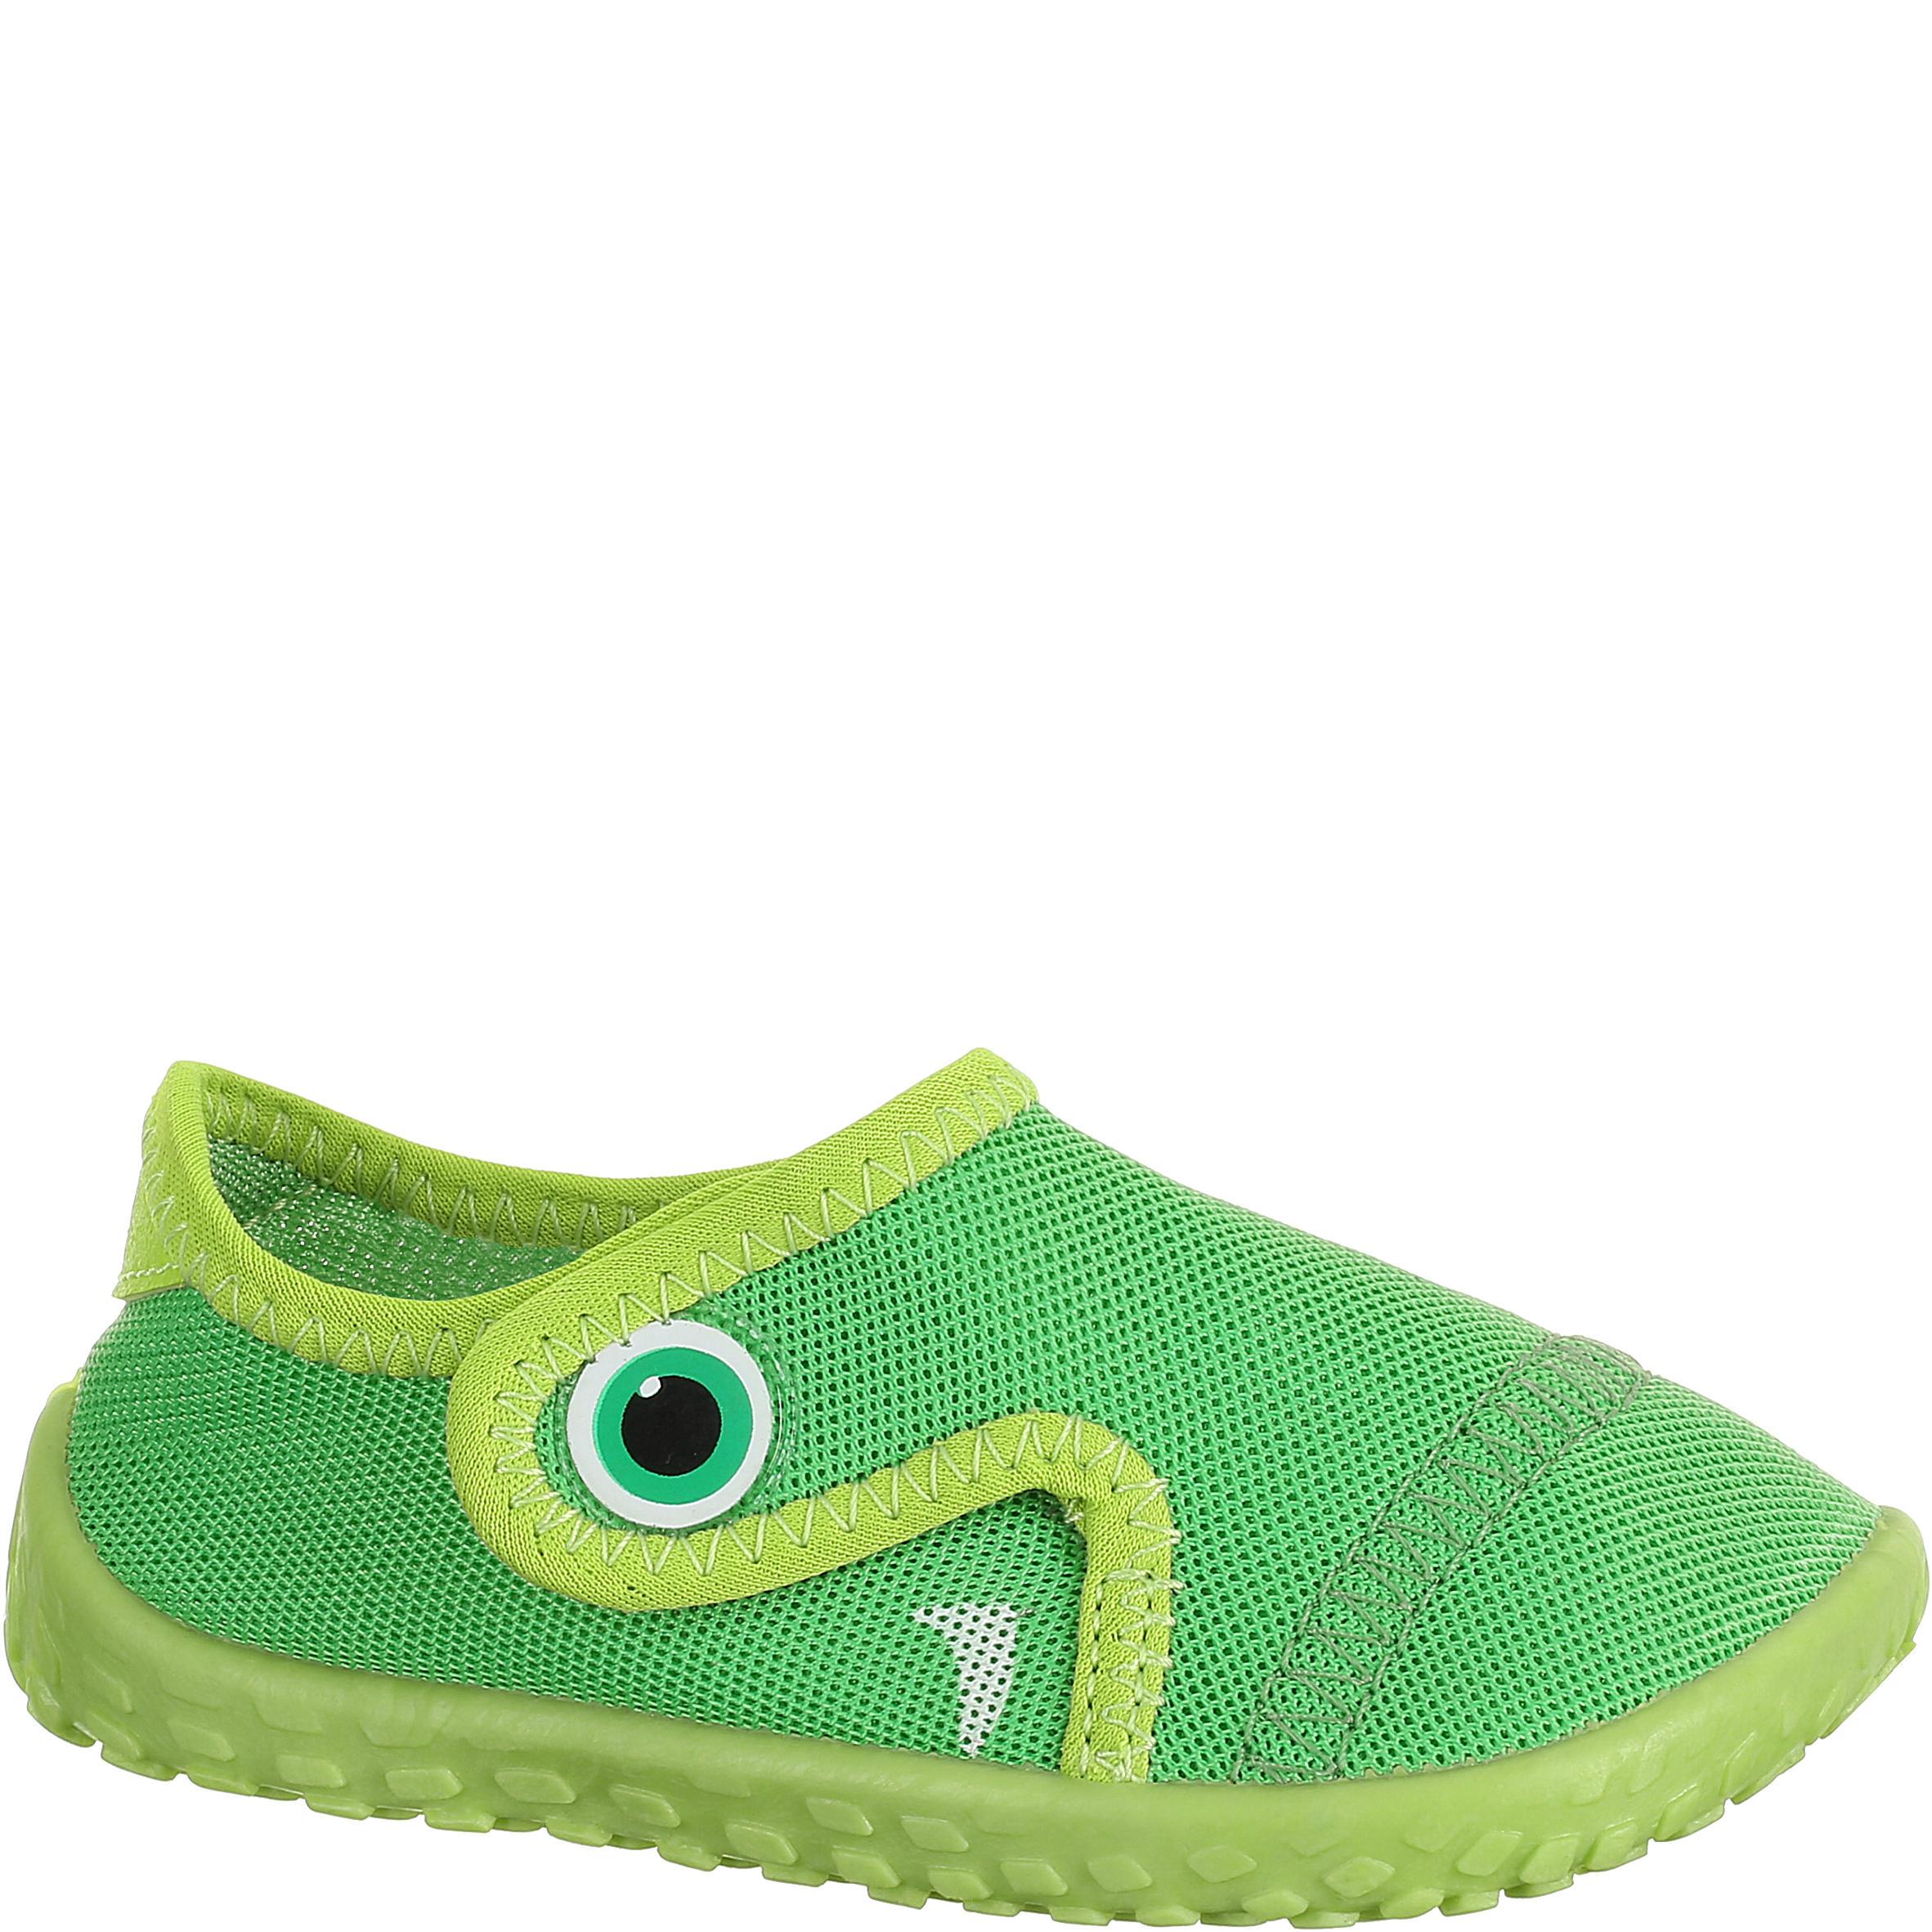 Baby Aquashoes 100 - Green - Decathlon